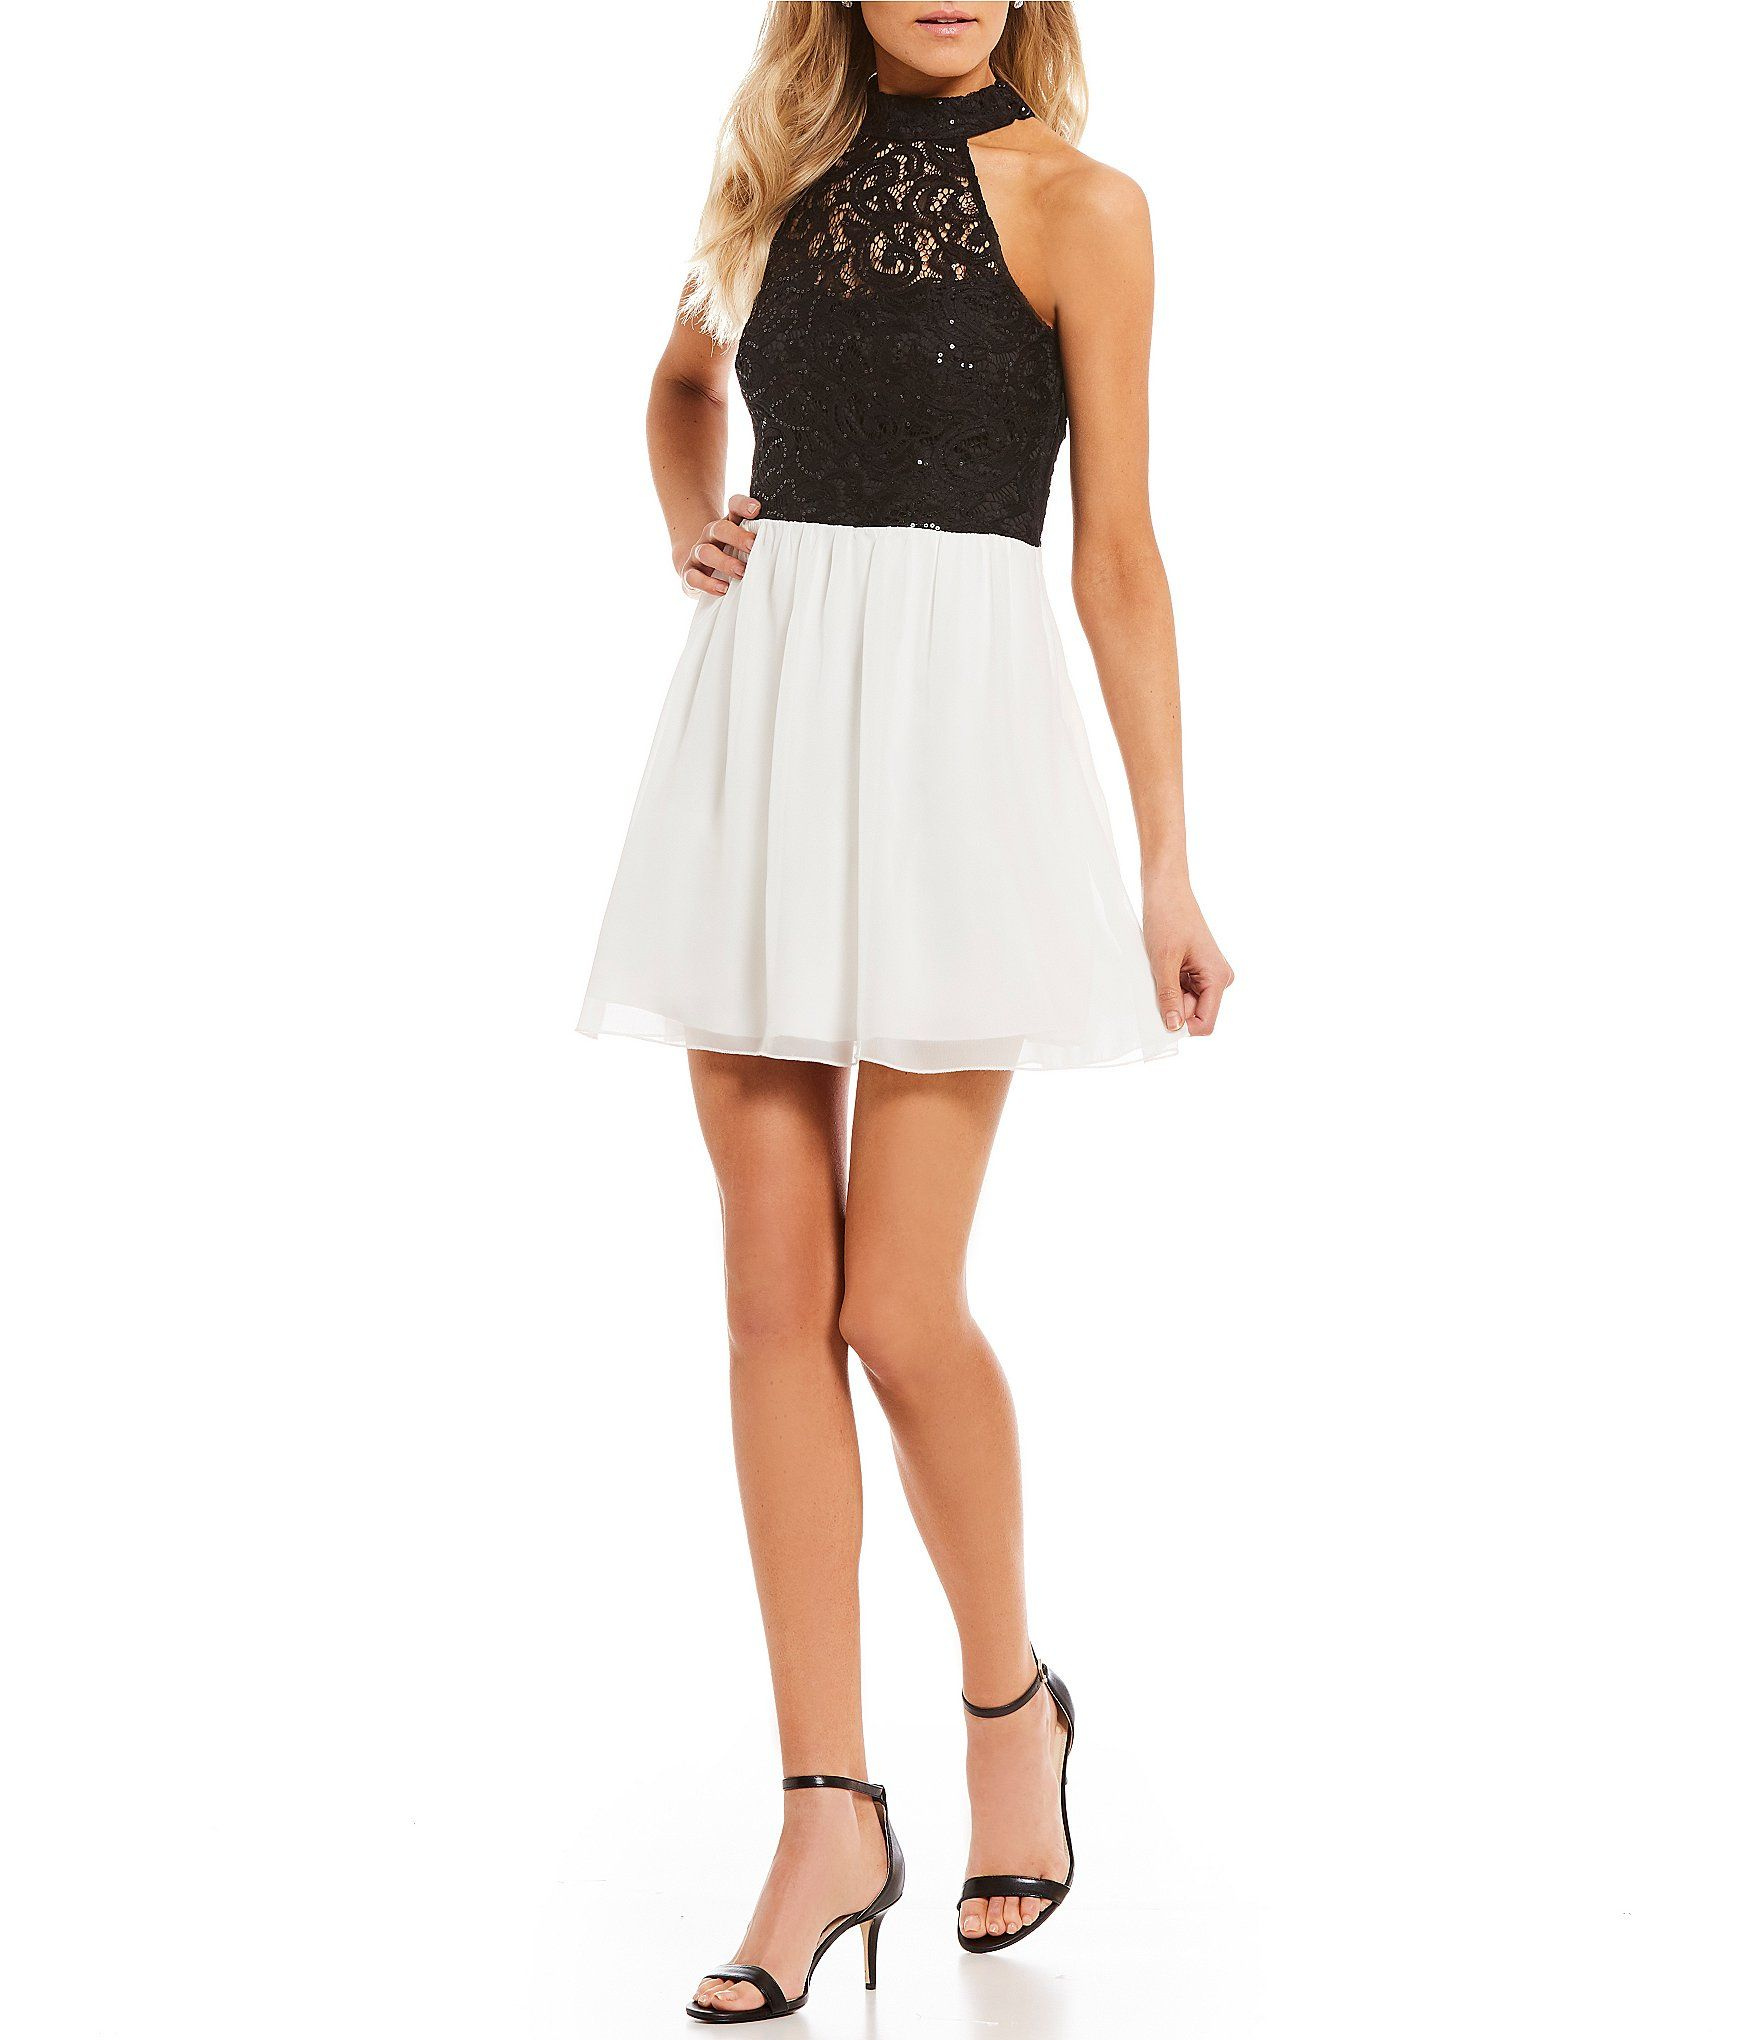 ddad52f2be7 Xtraordinary Mock Neck Sequin Lace Bodice FitAndFlare Dress  Dillards